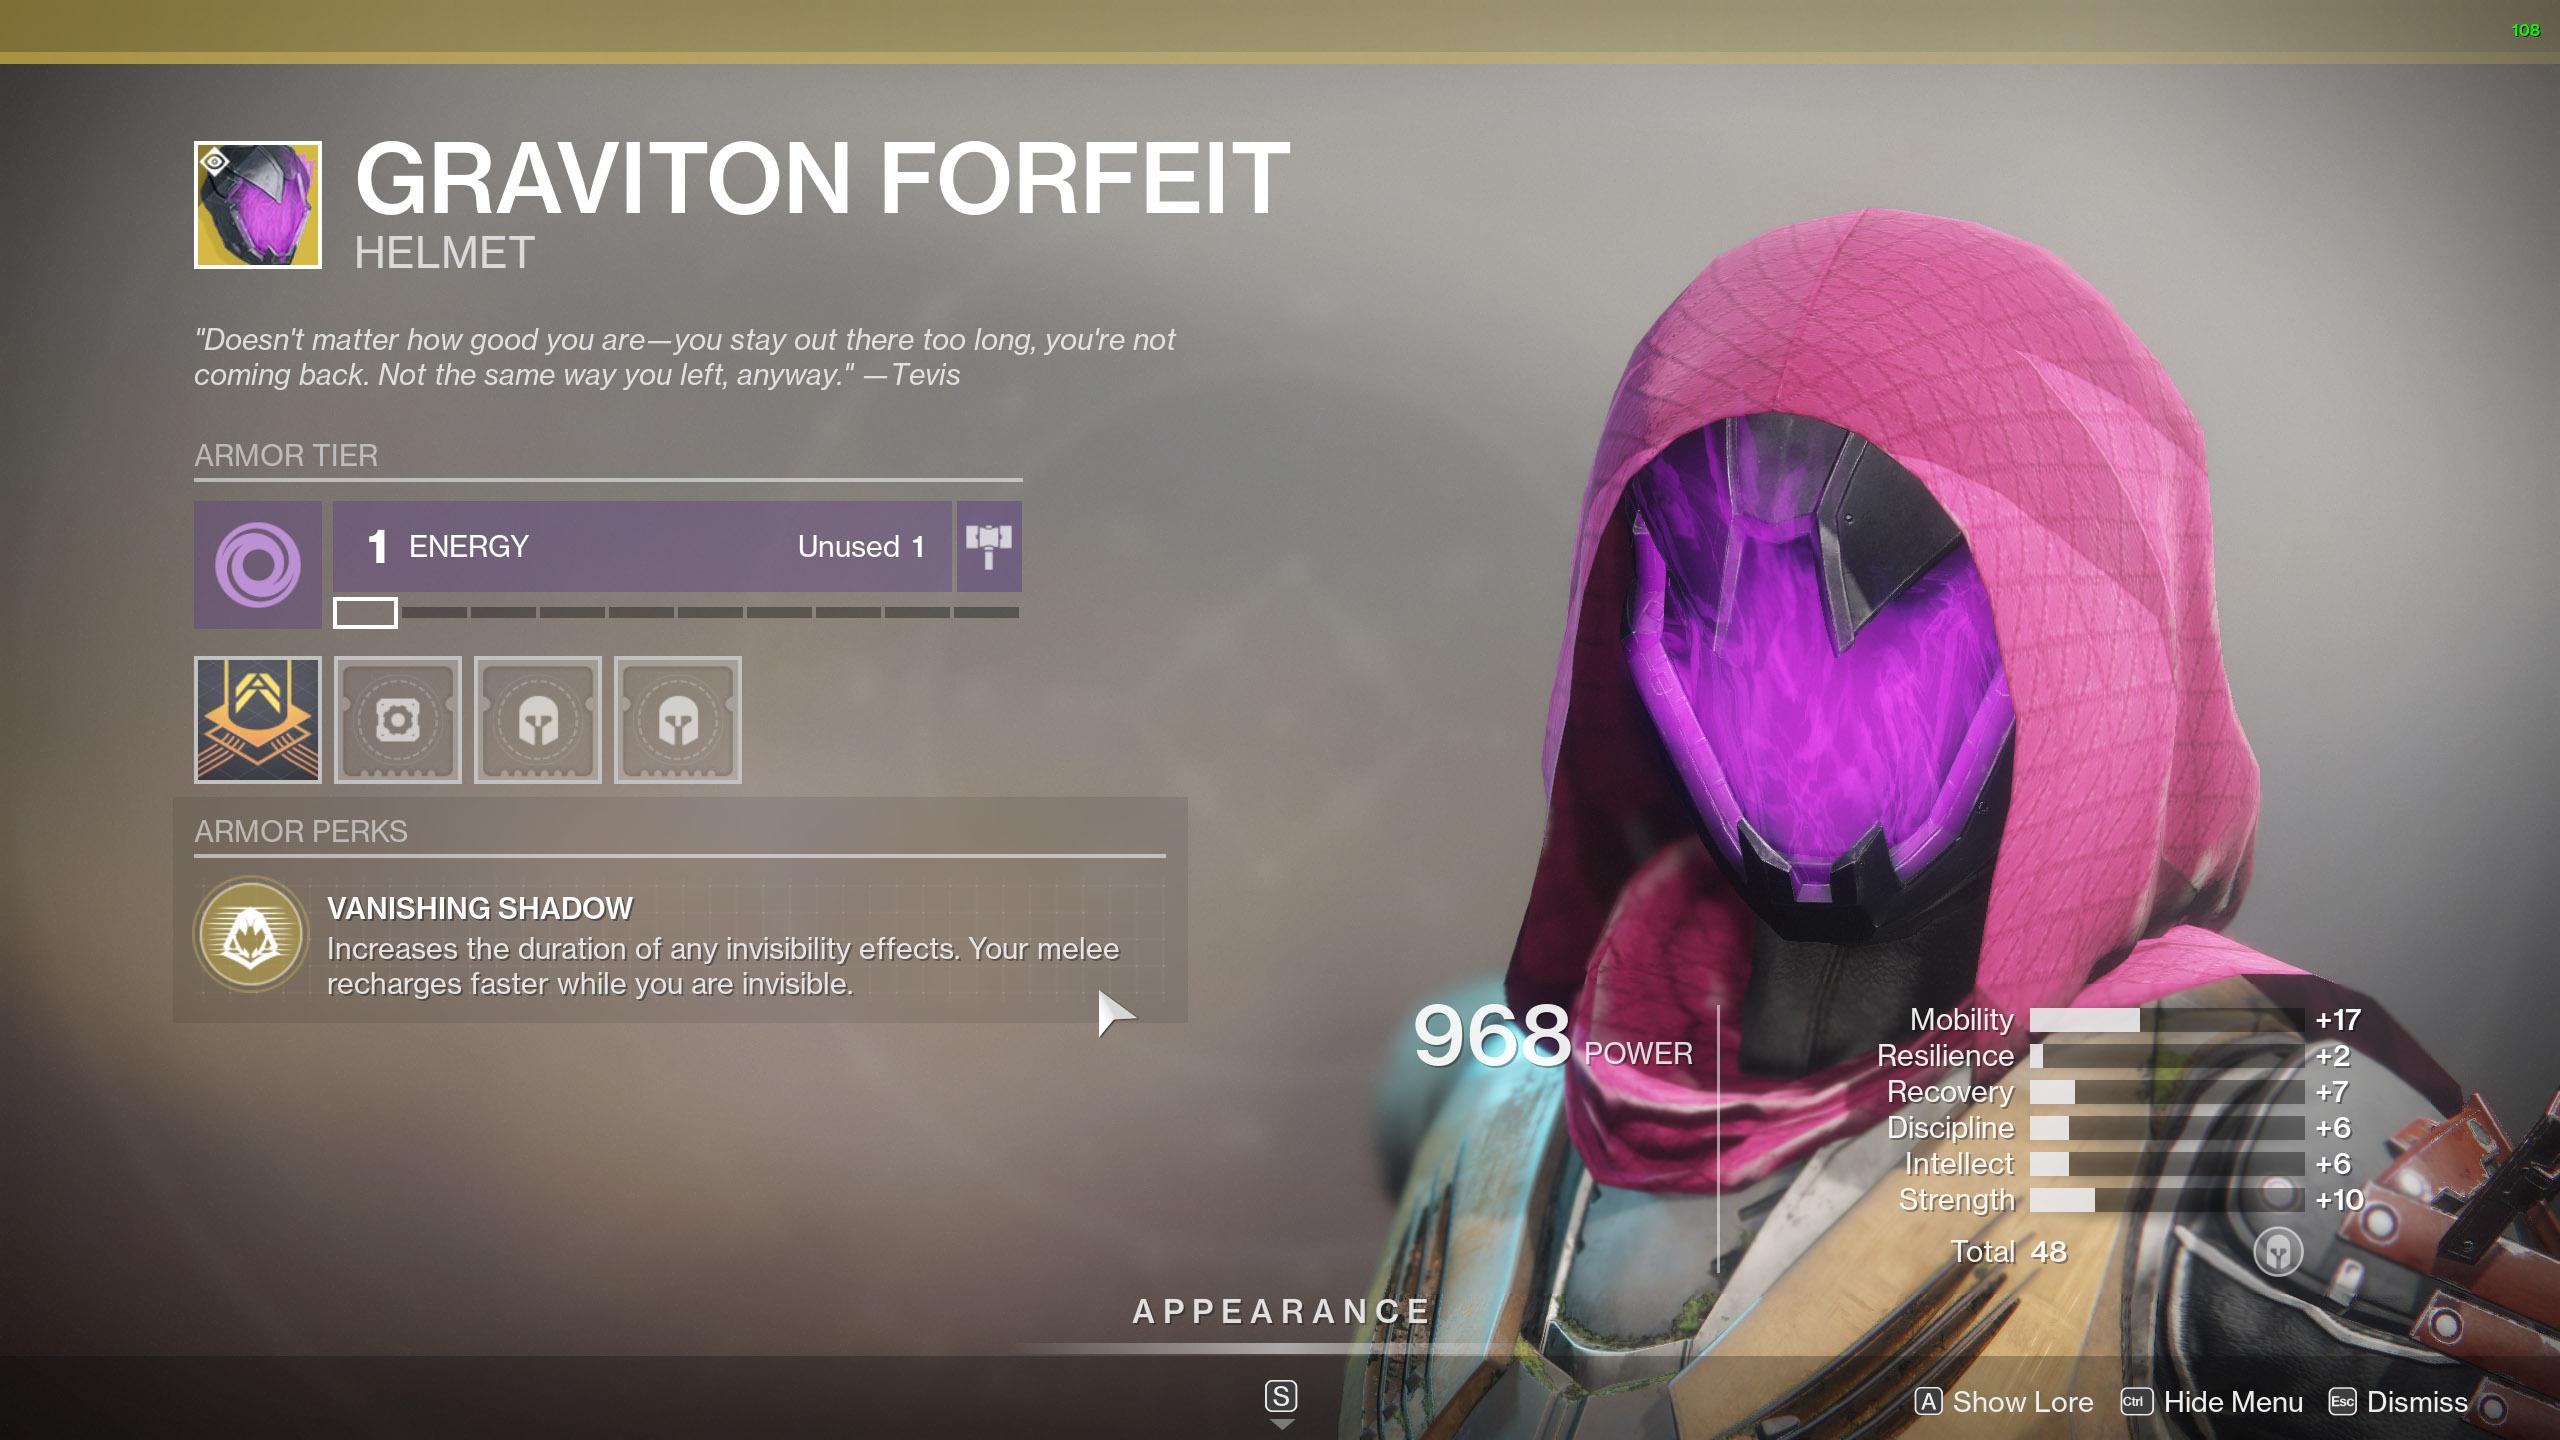 Destiny 2 Exotic Hunter armor Graviton Forfeit